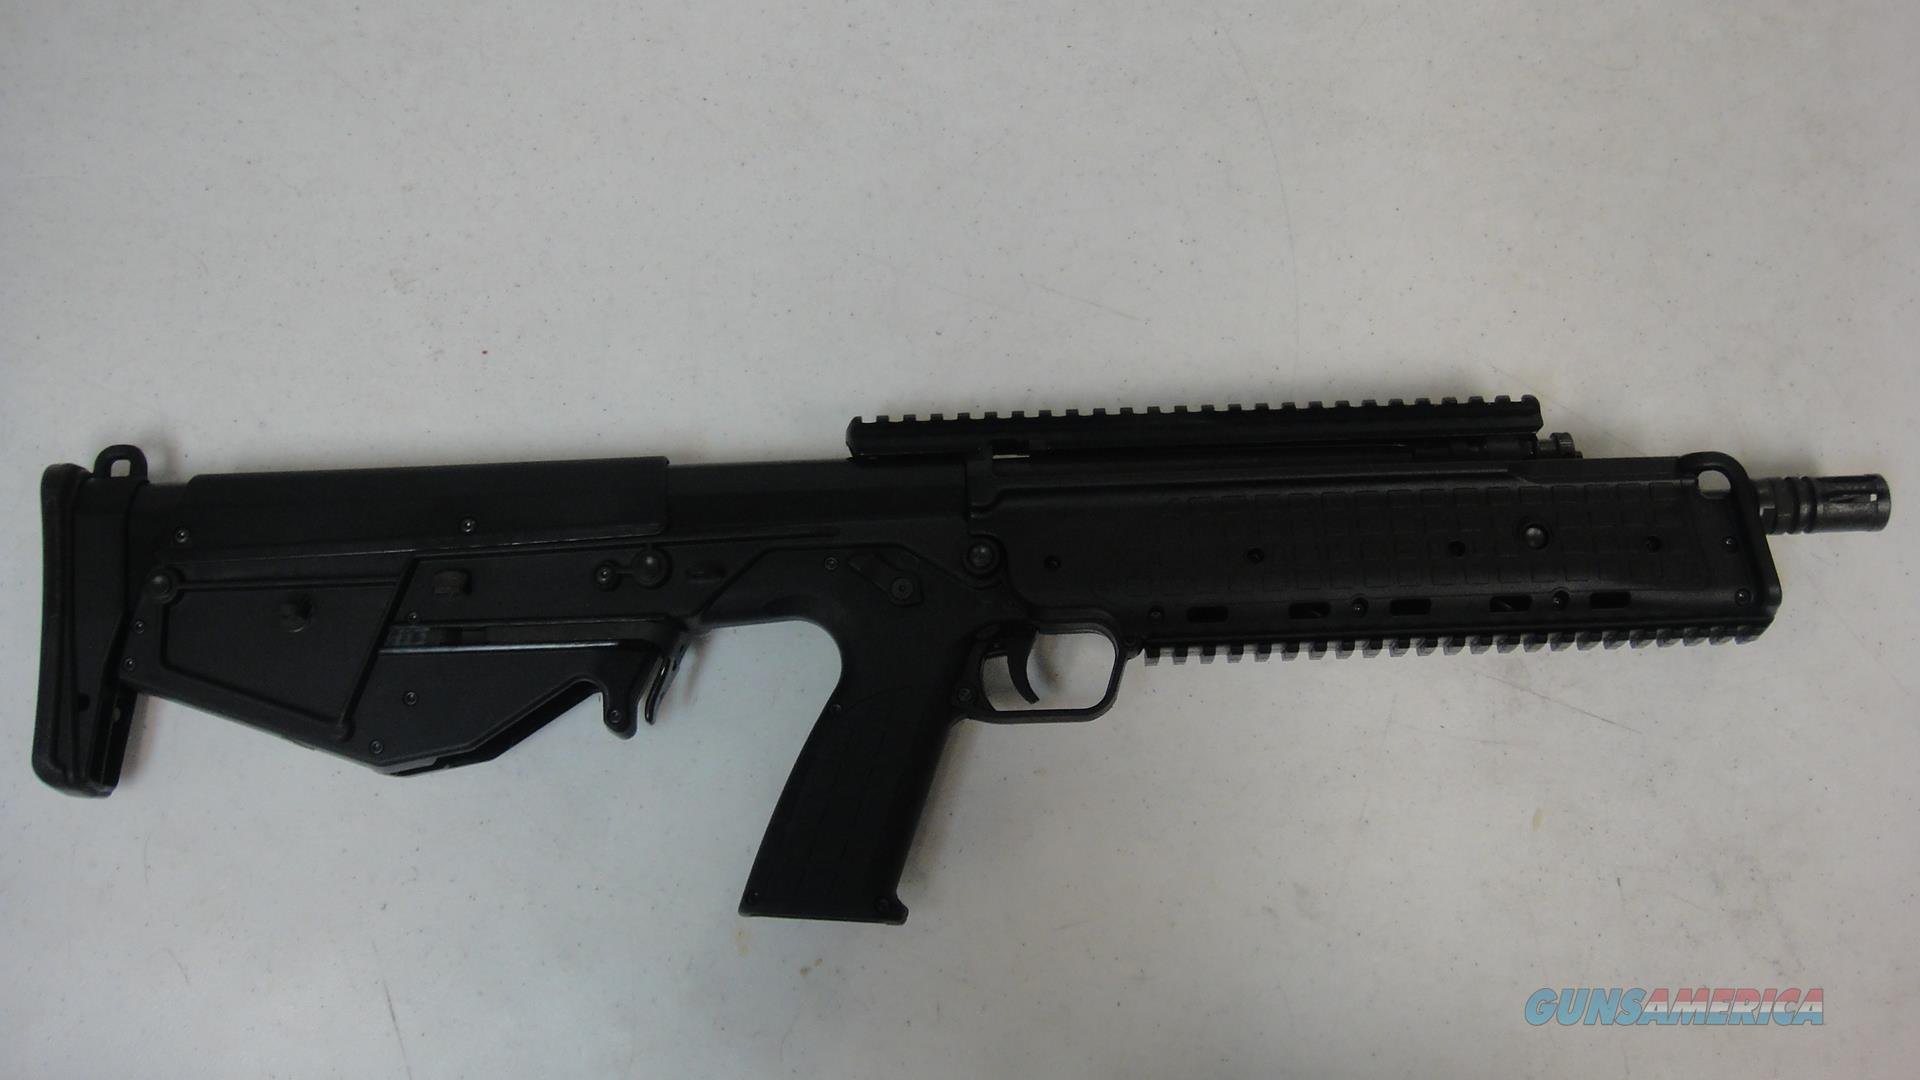 Kel-Tec RDB  Guns > Rifles > Kel-Tec Rifles